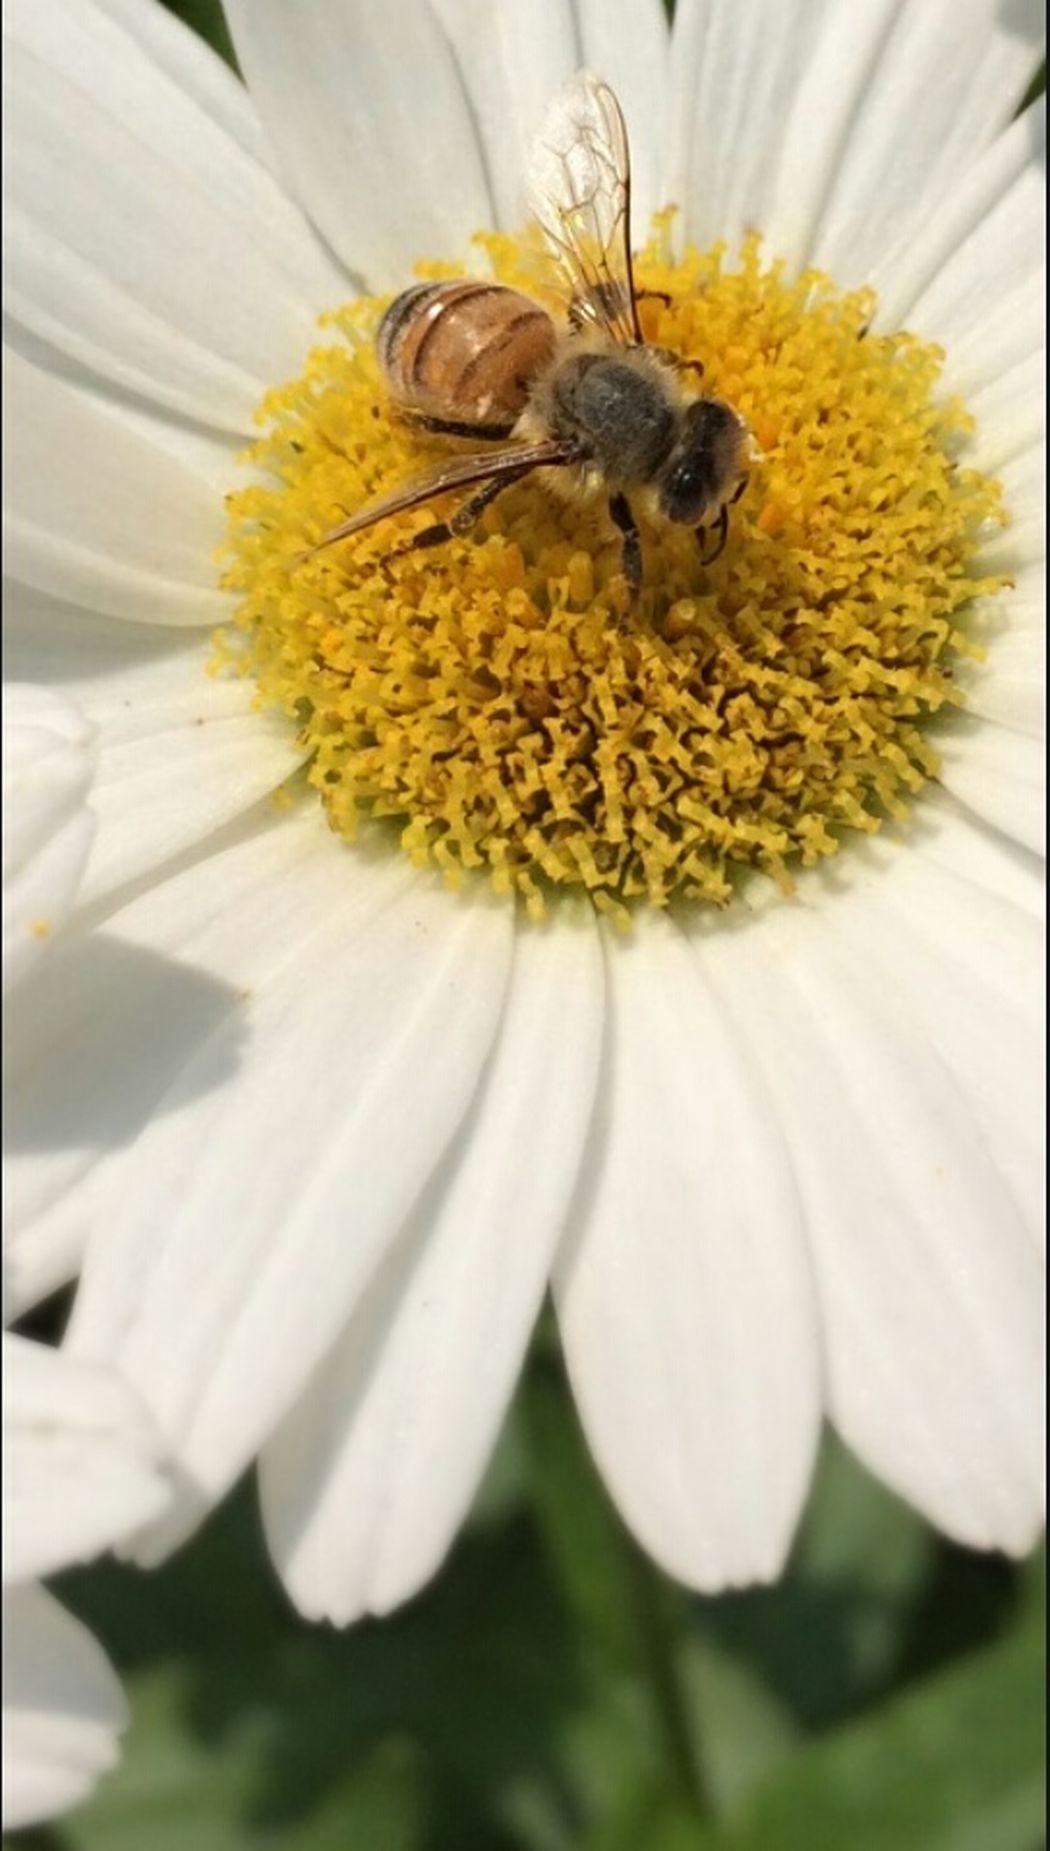 A Bee Summertime Daisy Beelove Savethebees